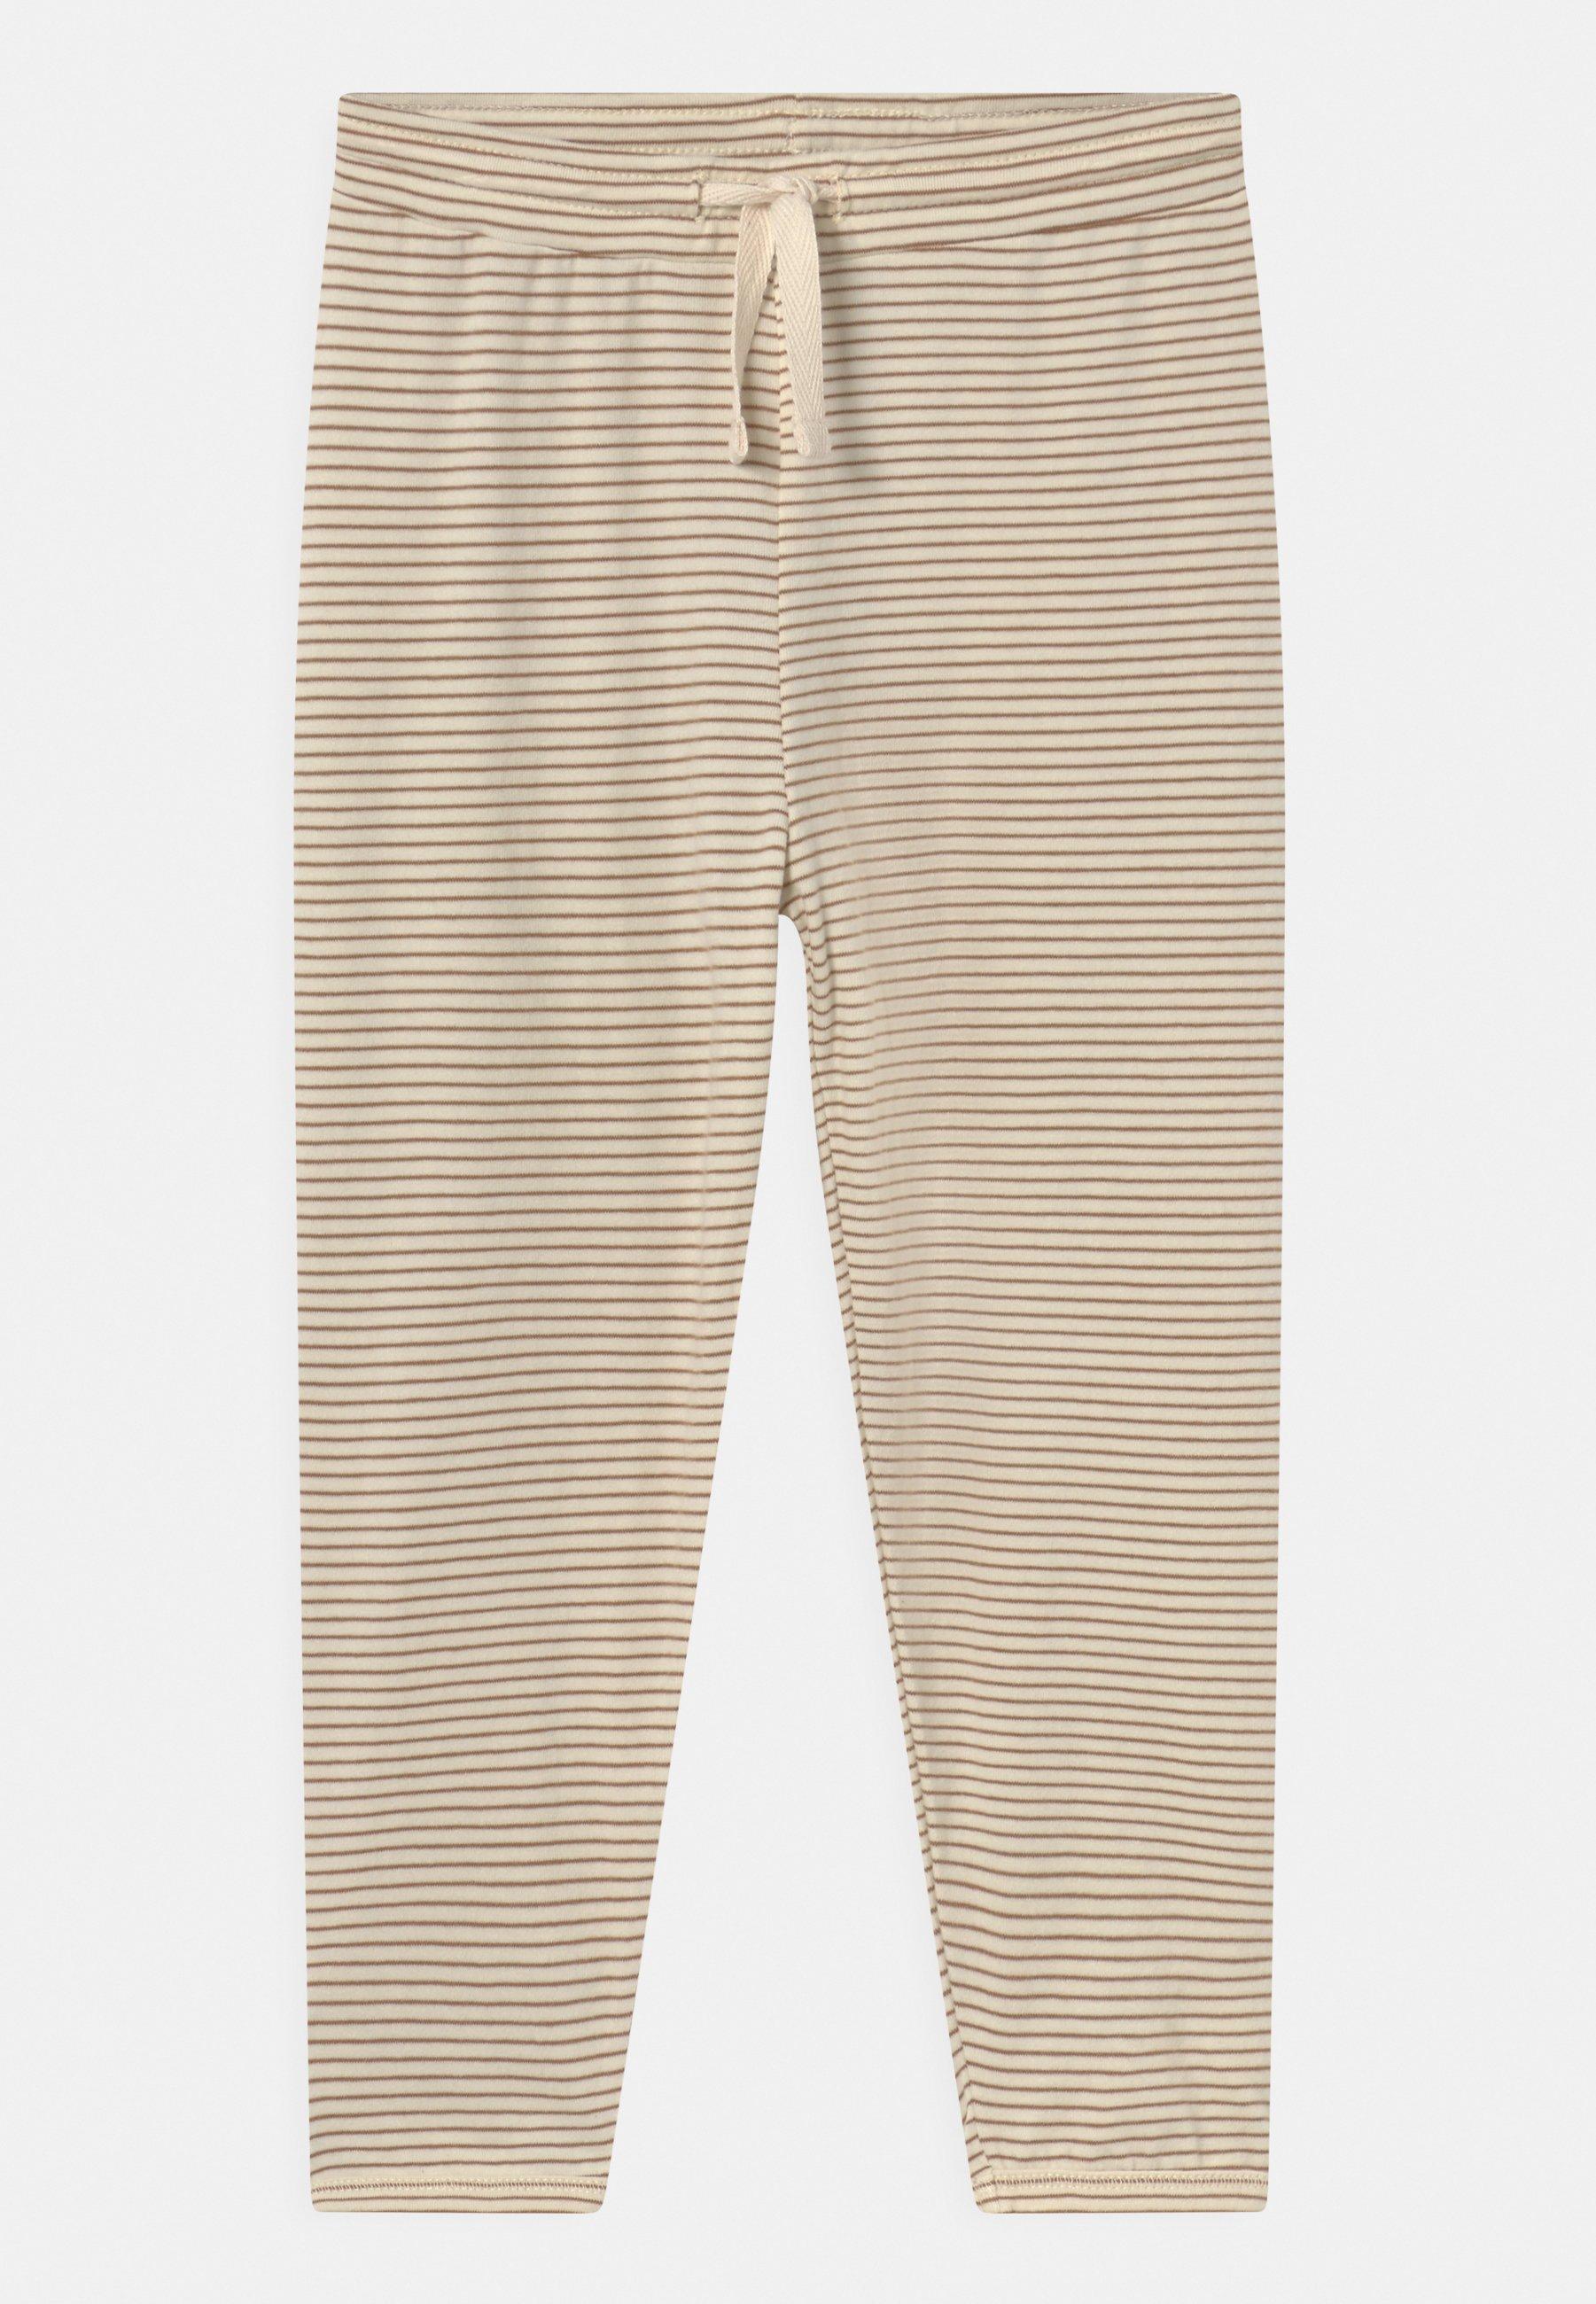 Kids REYA PANTS - Leggings - Trousers